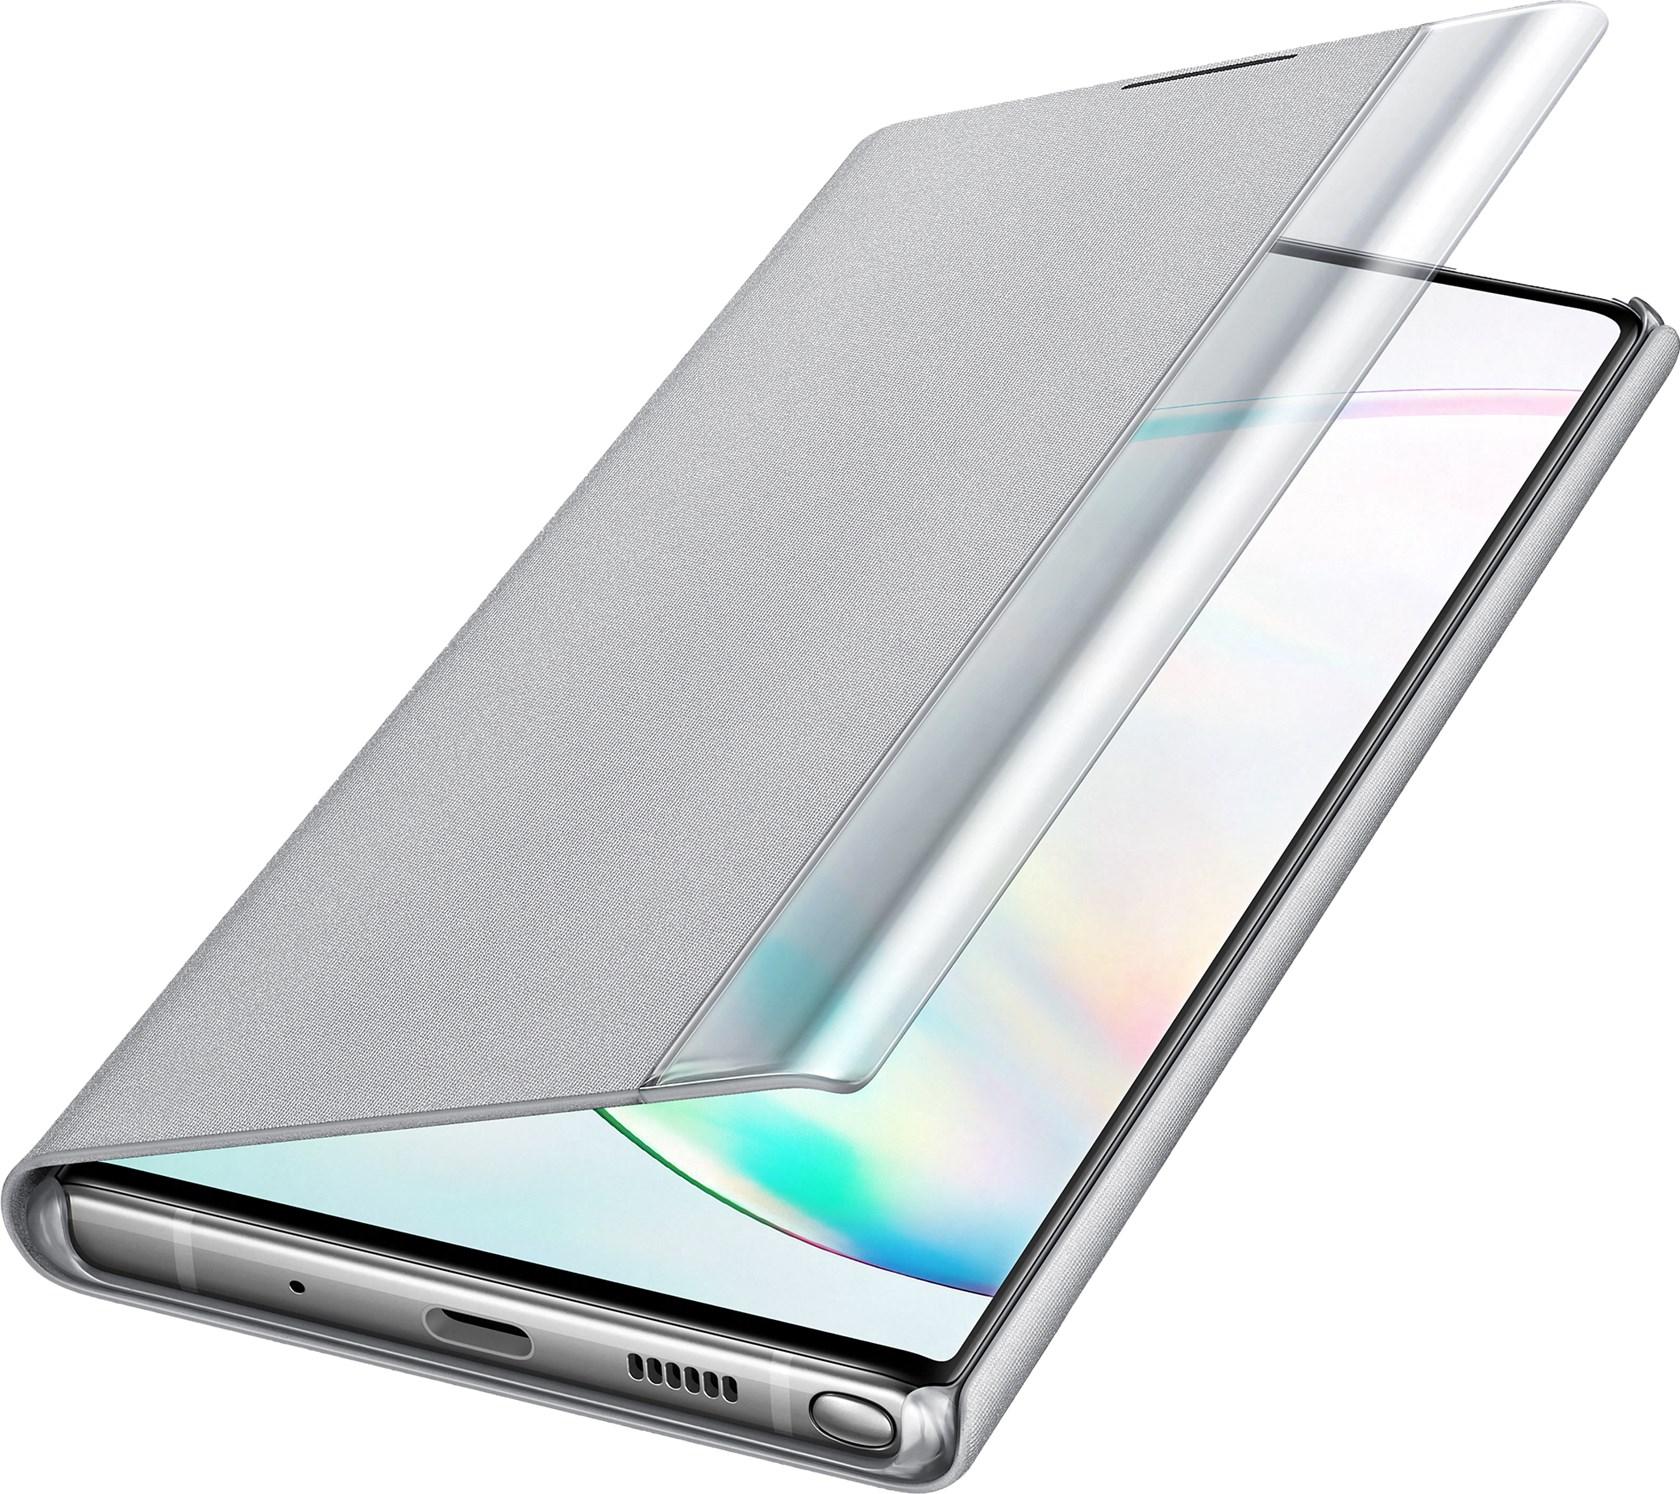 Samsung Clear View Cover Galaxy Note 10 Plus Silver Ef-Zn975csegww